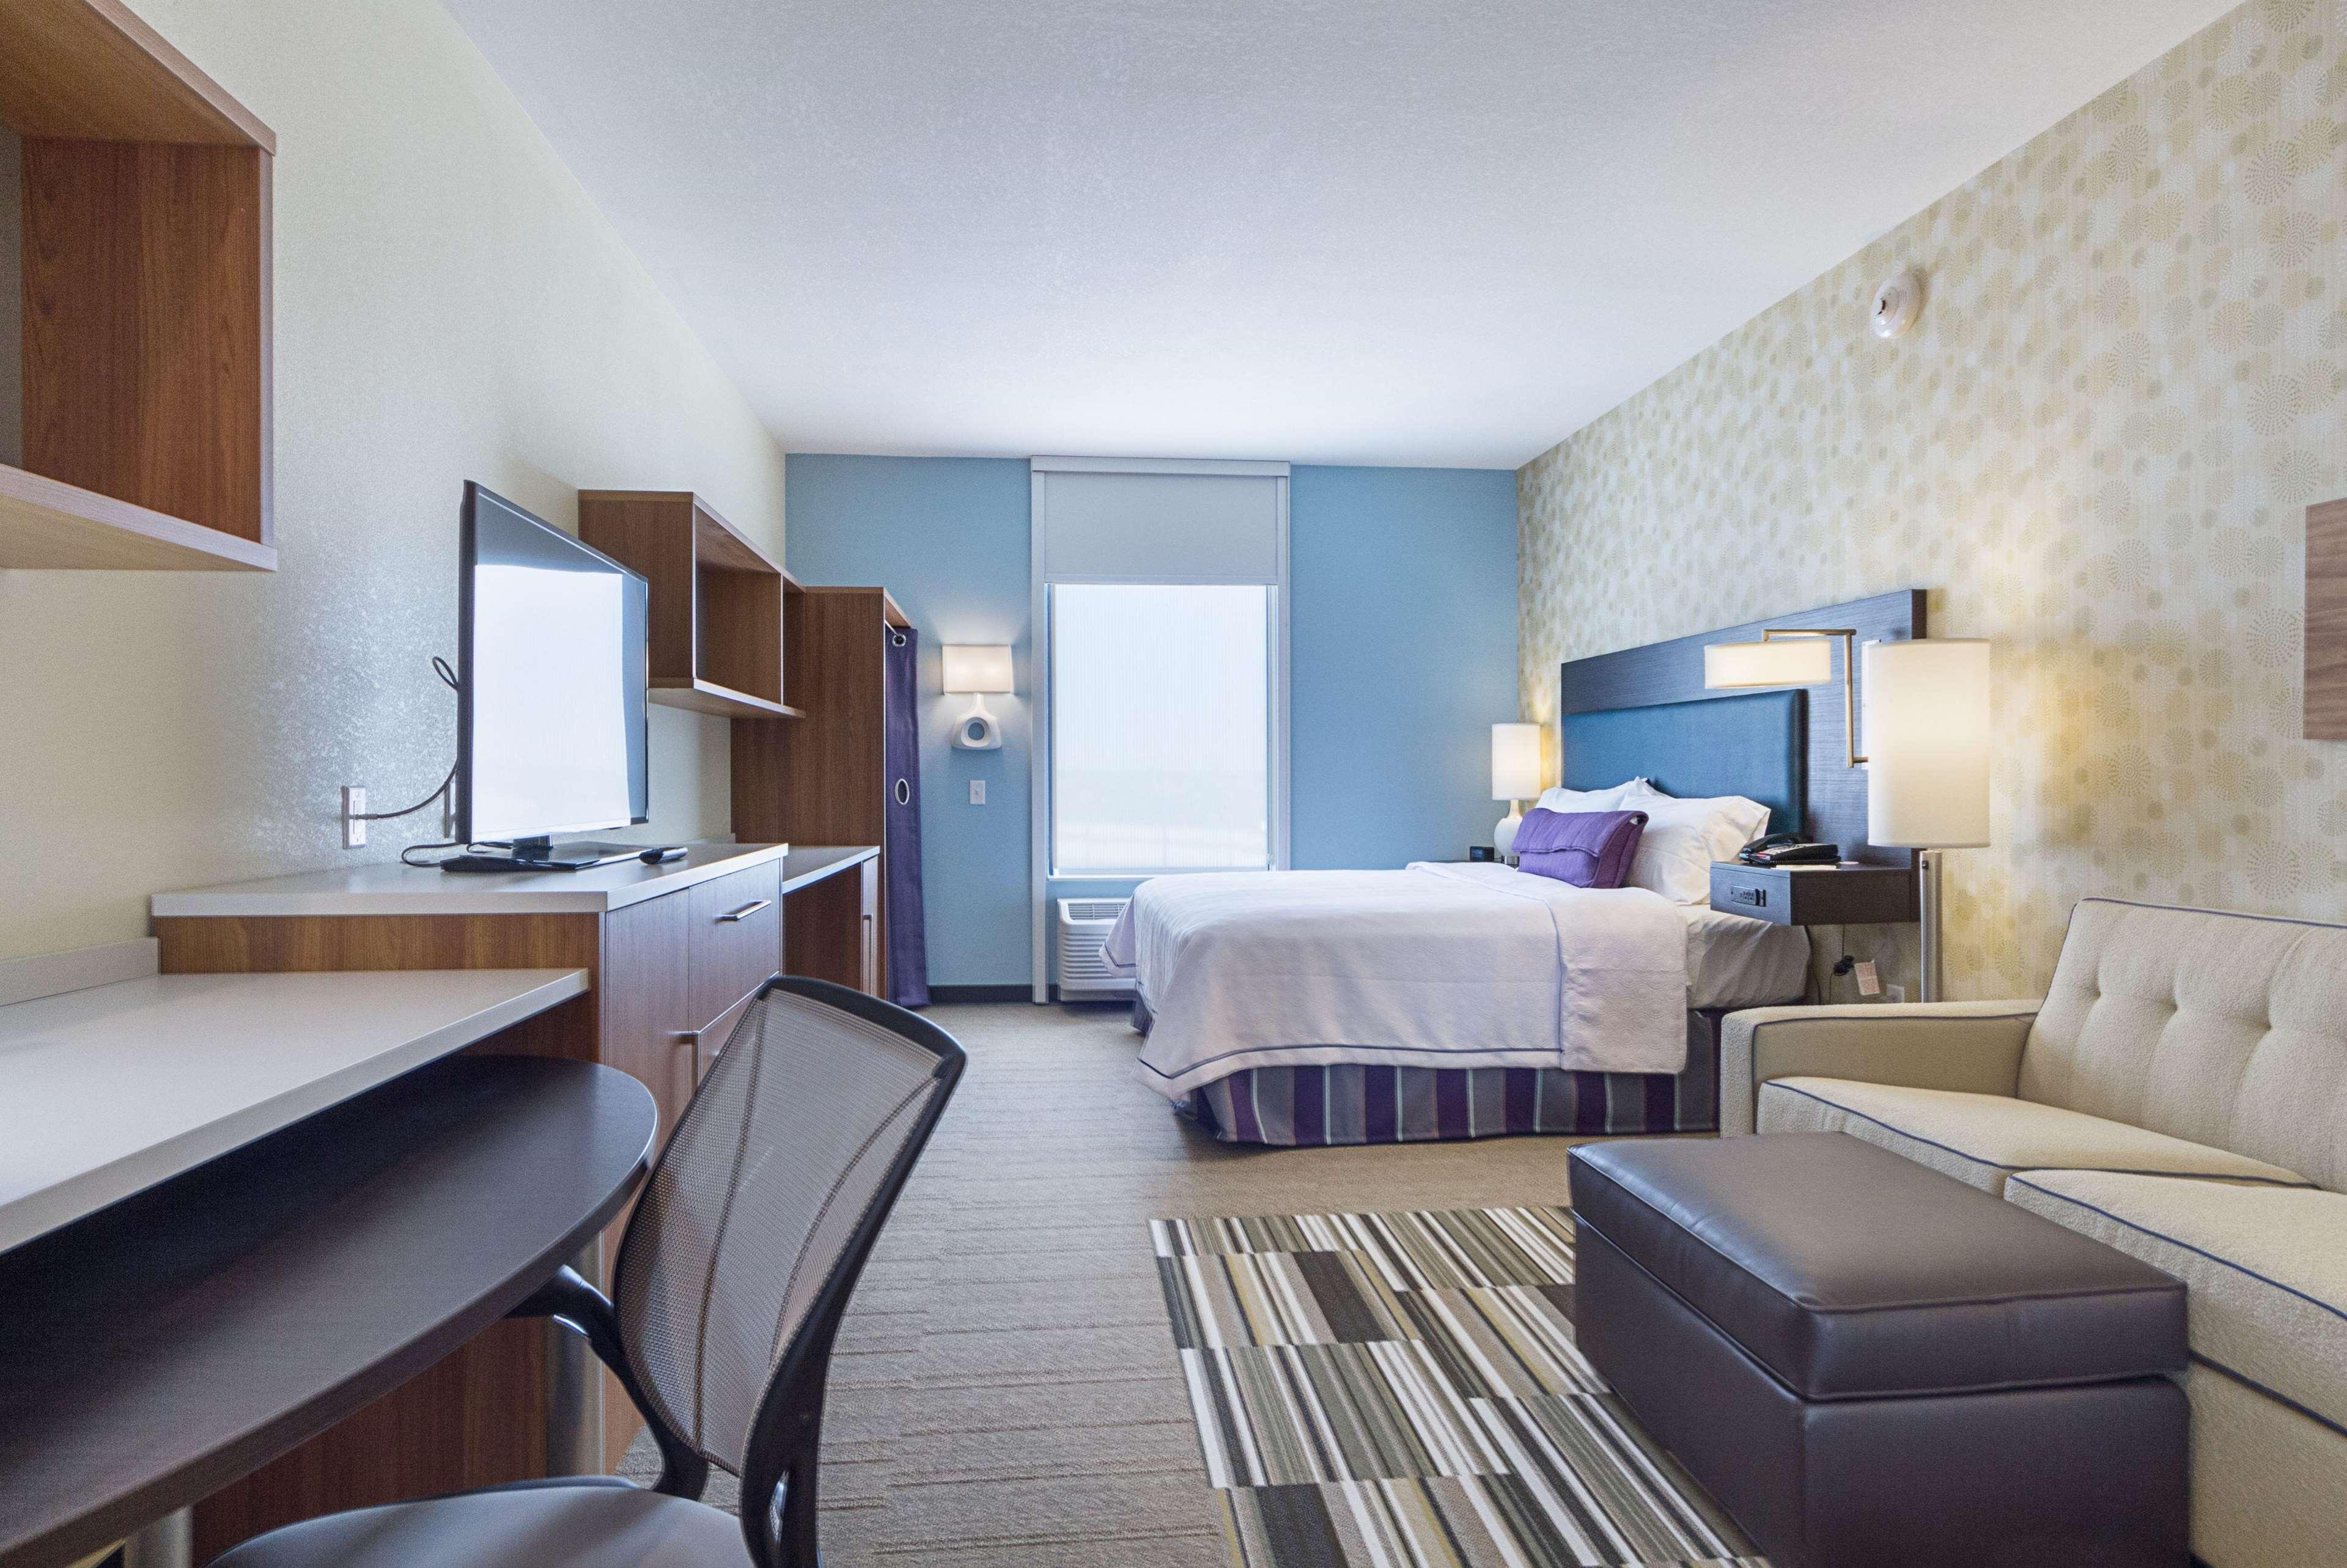 Home 2 Suites by Hilton - Yukon image 48